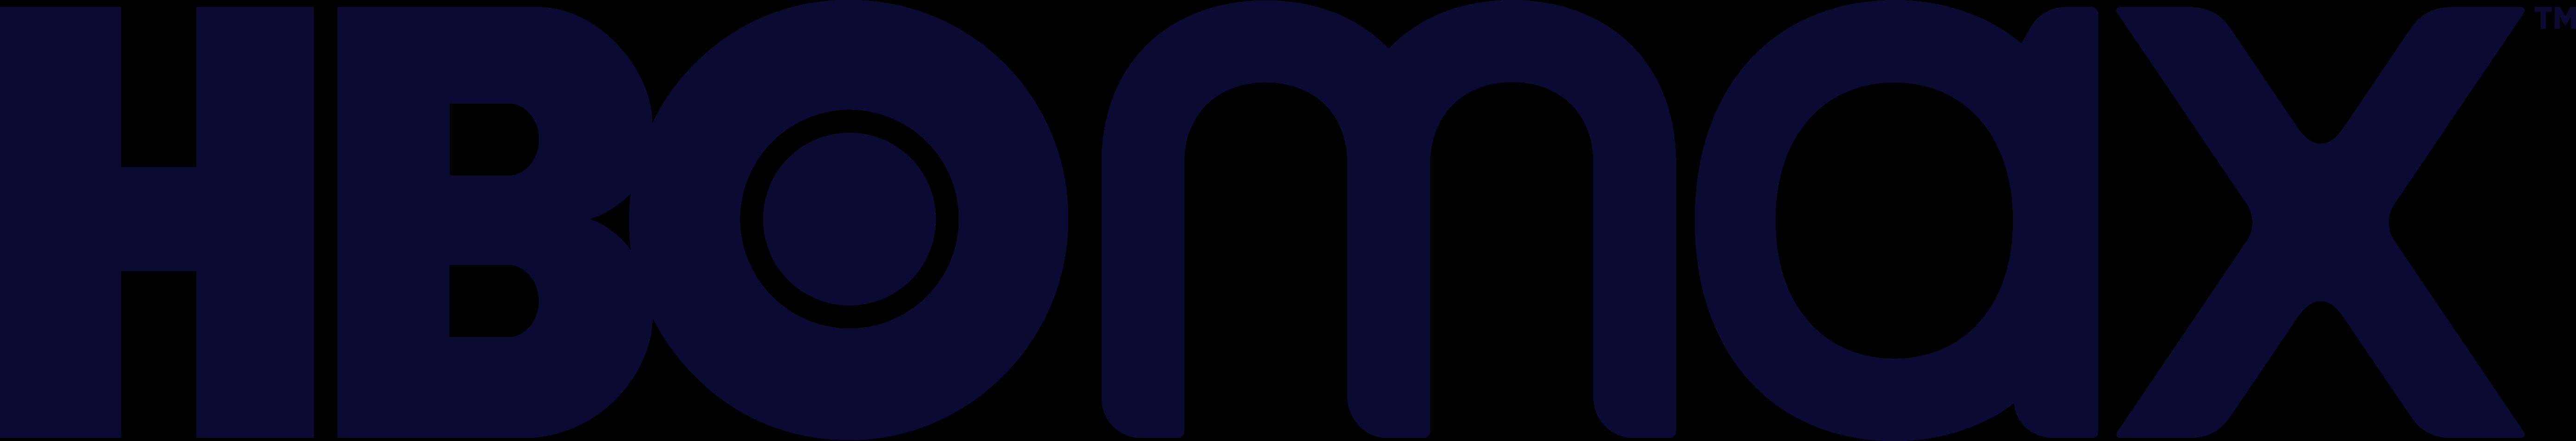 HBO Max Channel   Premium Channel   DISH Satellite TV